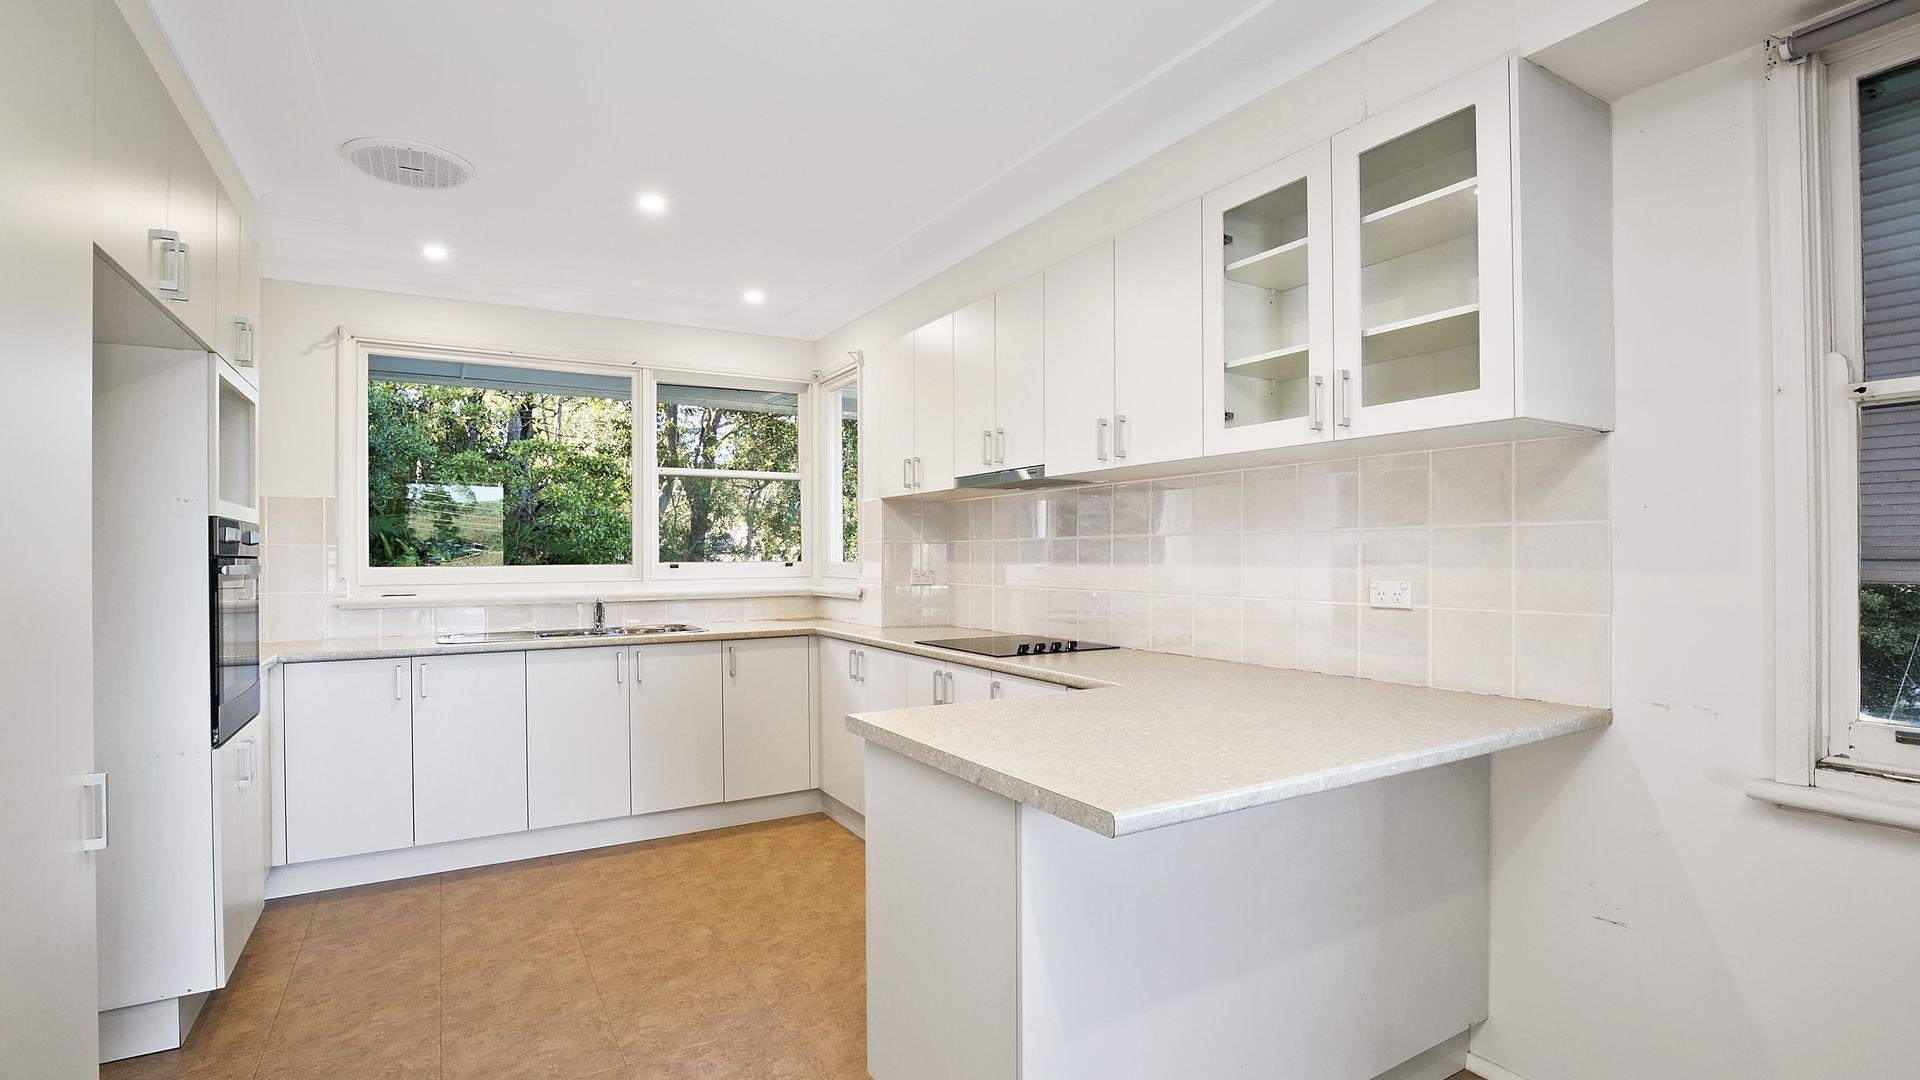 9 Newby Place, Collaroy Plateau NSW 2097, Image 1